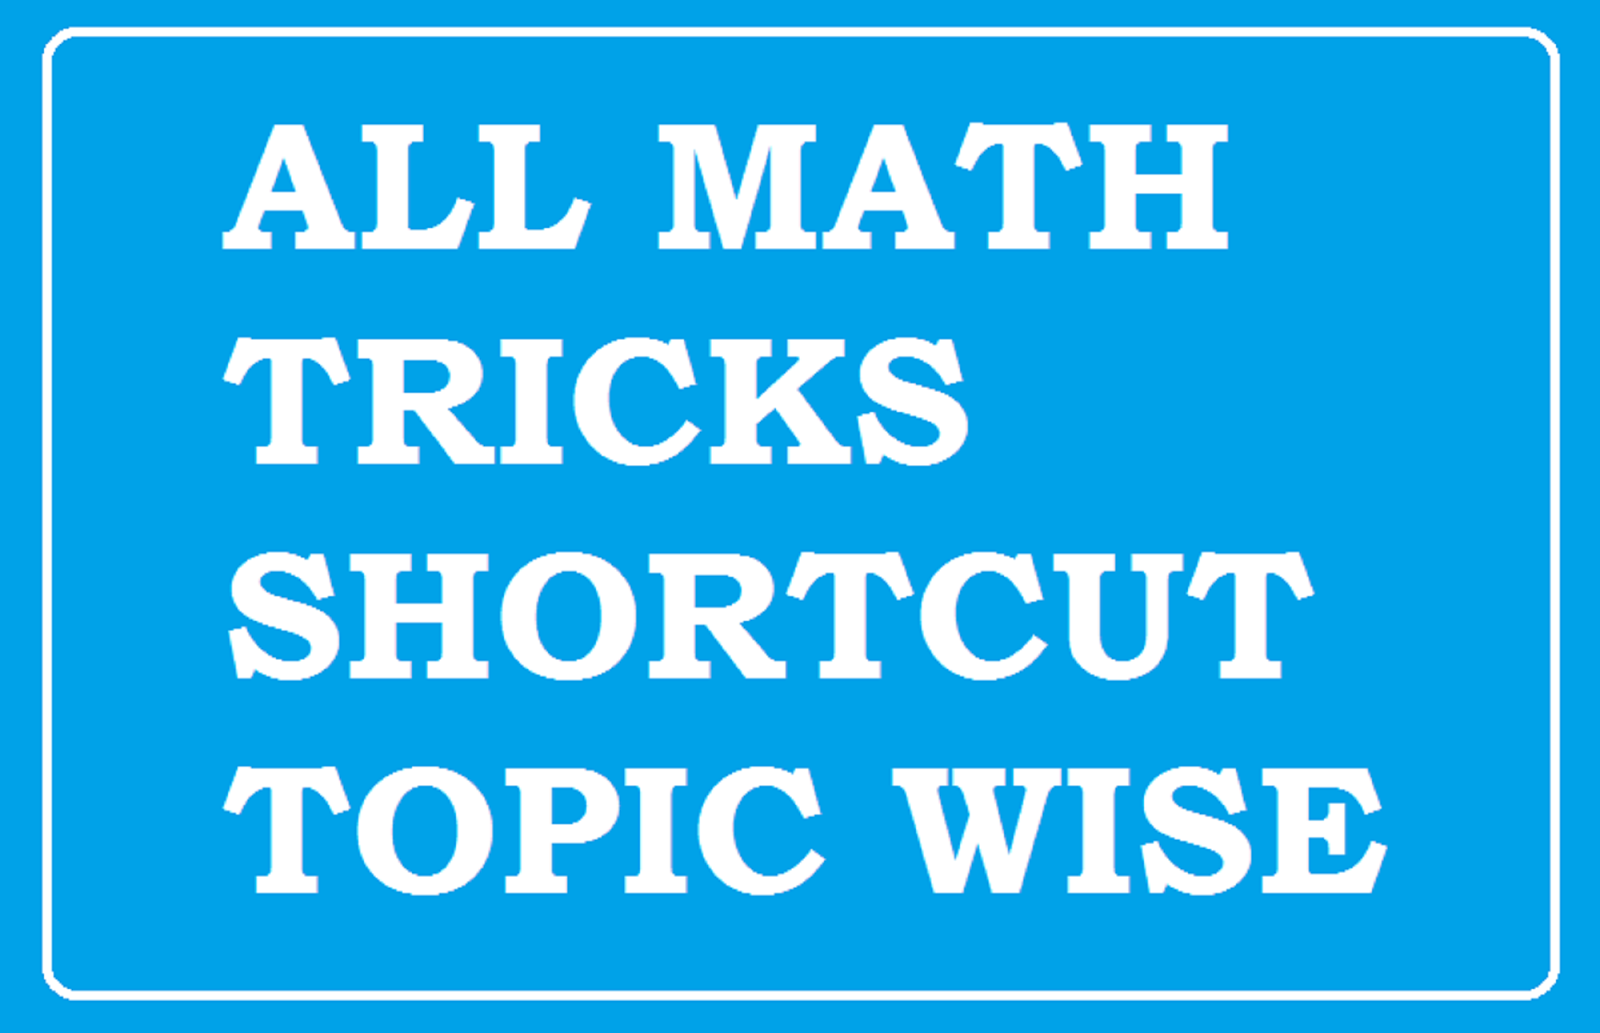 50 ANSWER TO MATH PROBLEM 4X4+4X4+4-4X4=, 4X4+4X4+4-4X4= ANSWER ...